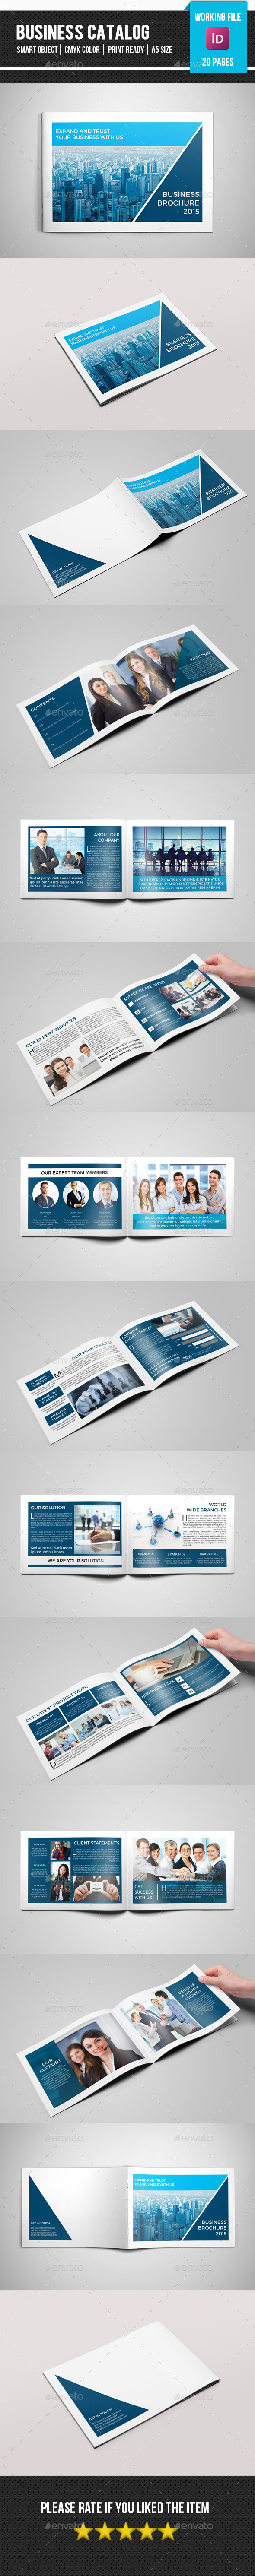 Business Catalog/Brochure-V172 - Corporate Brochures